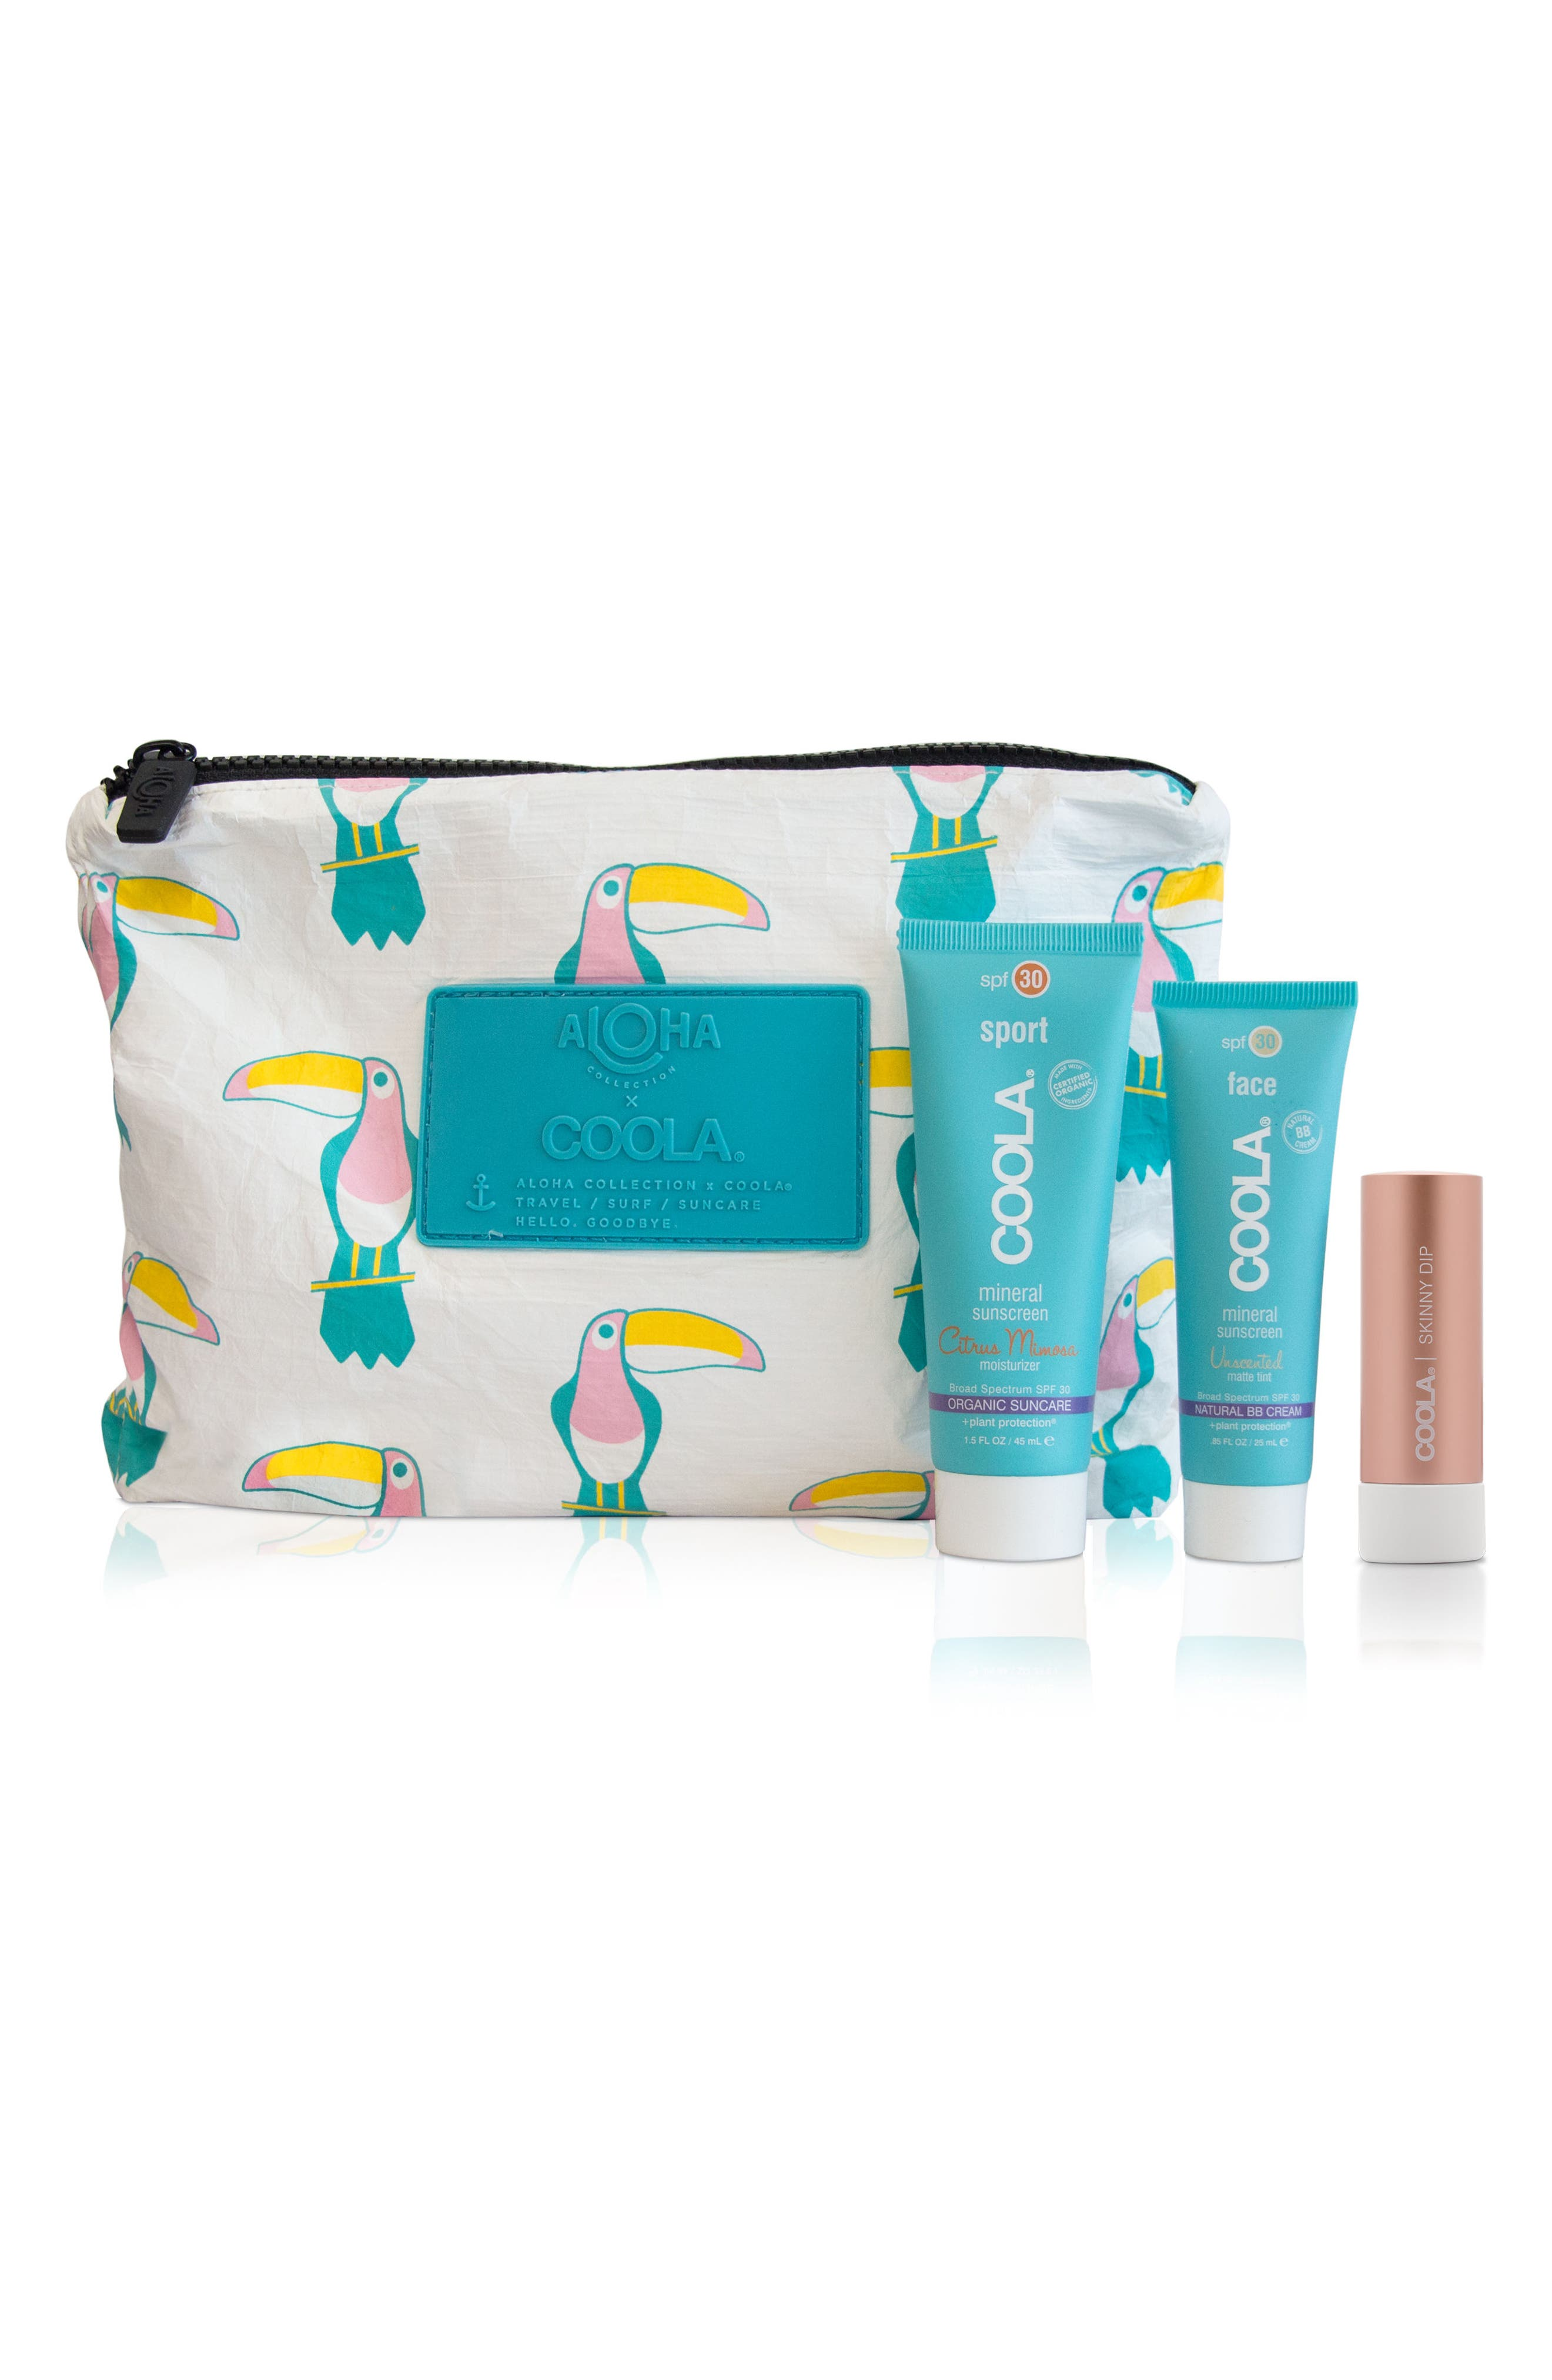 COOLA<sup>®</sup> Suncare x ALOHA Travel Set,                         Main,                         color, 000